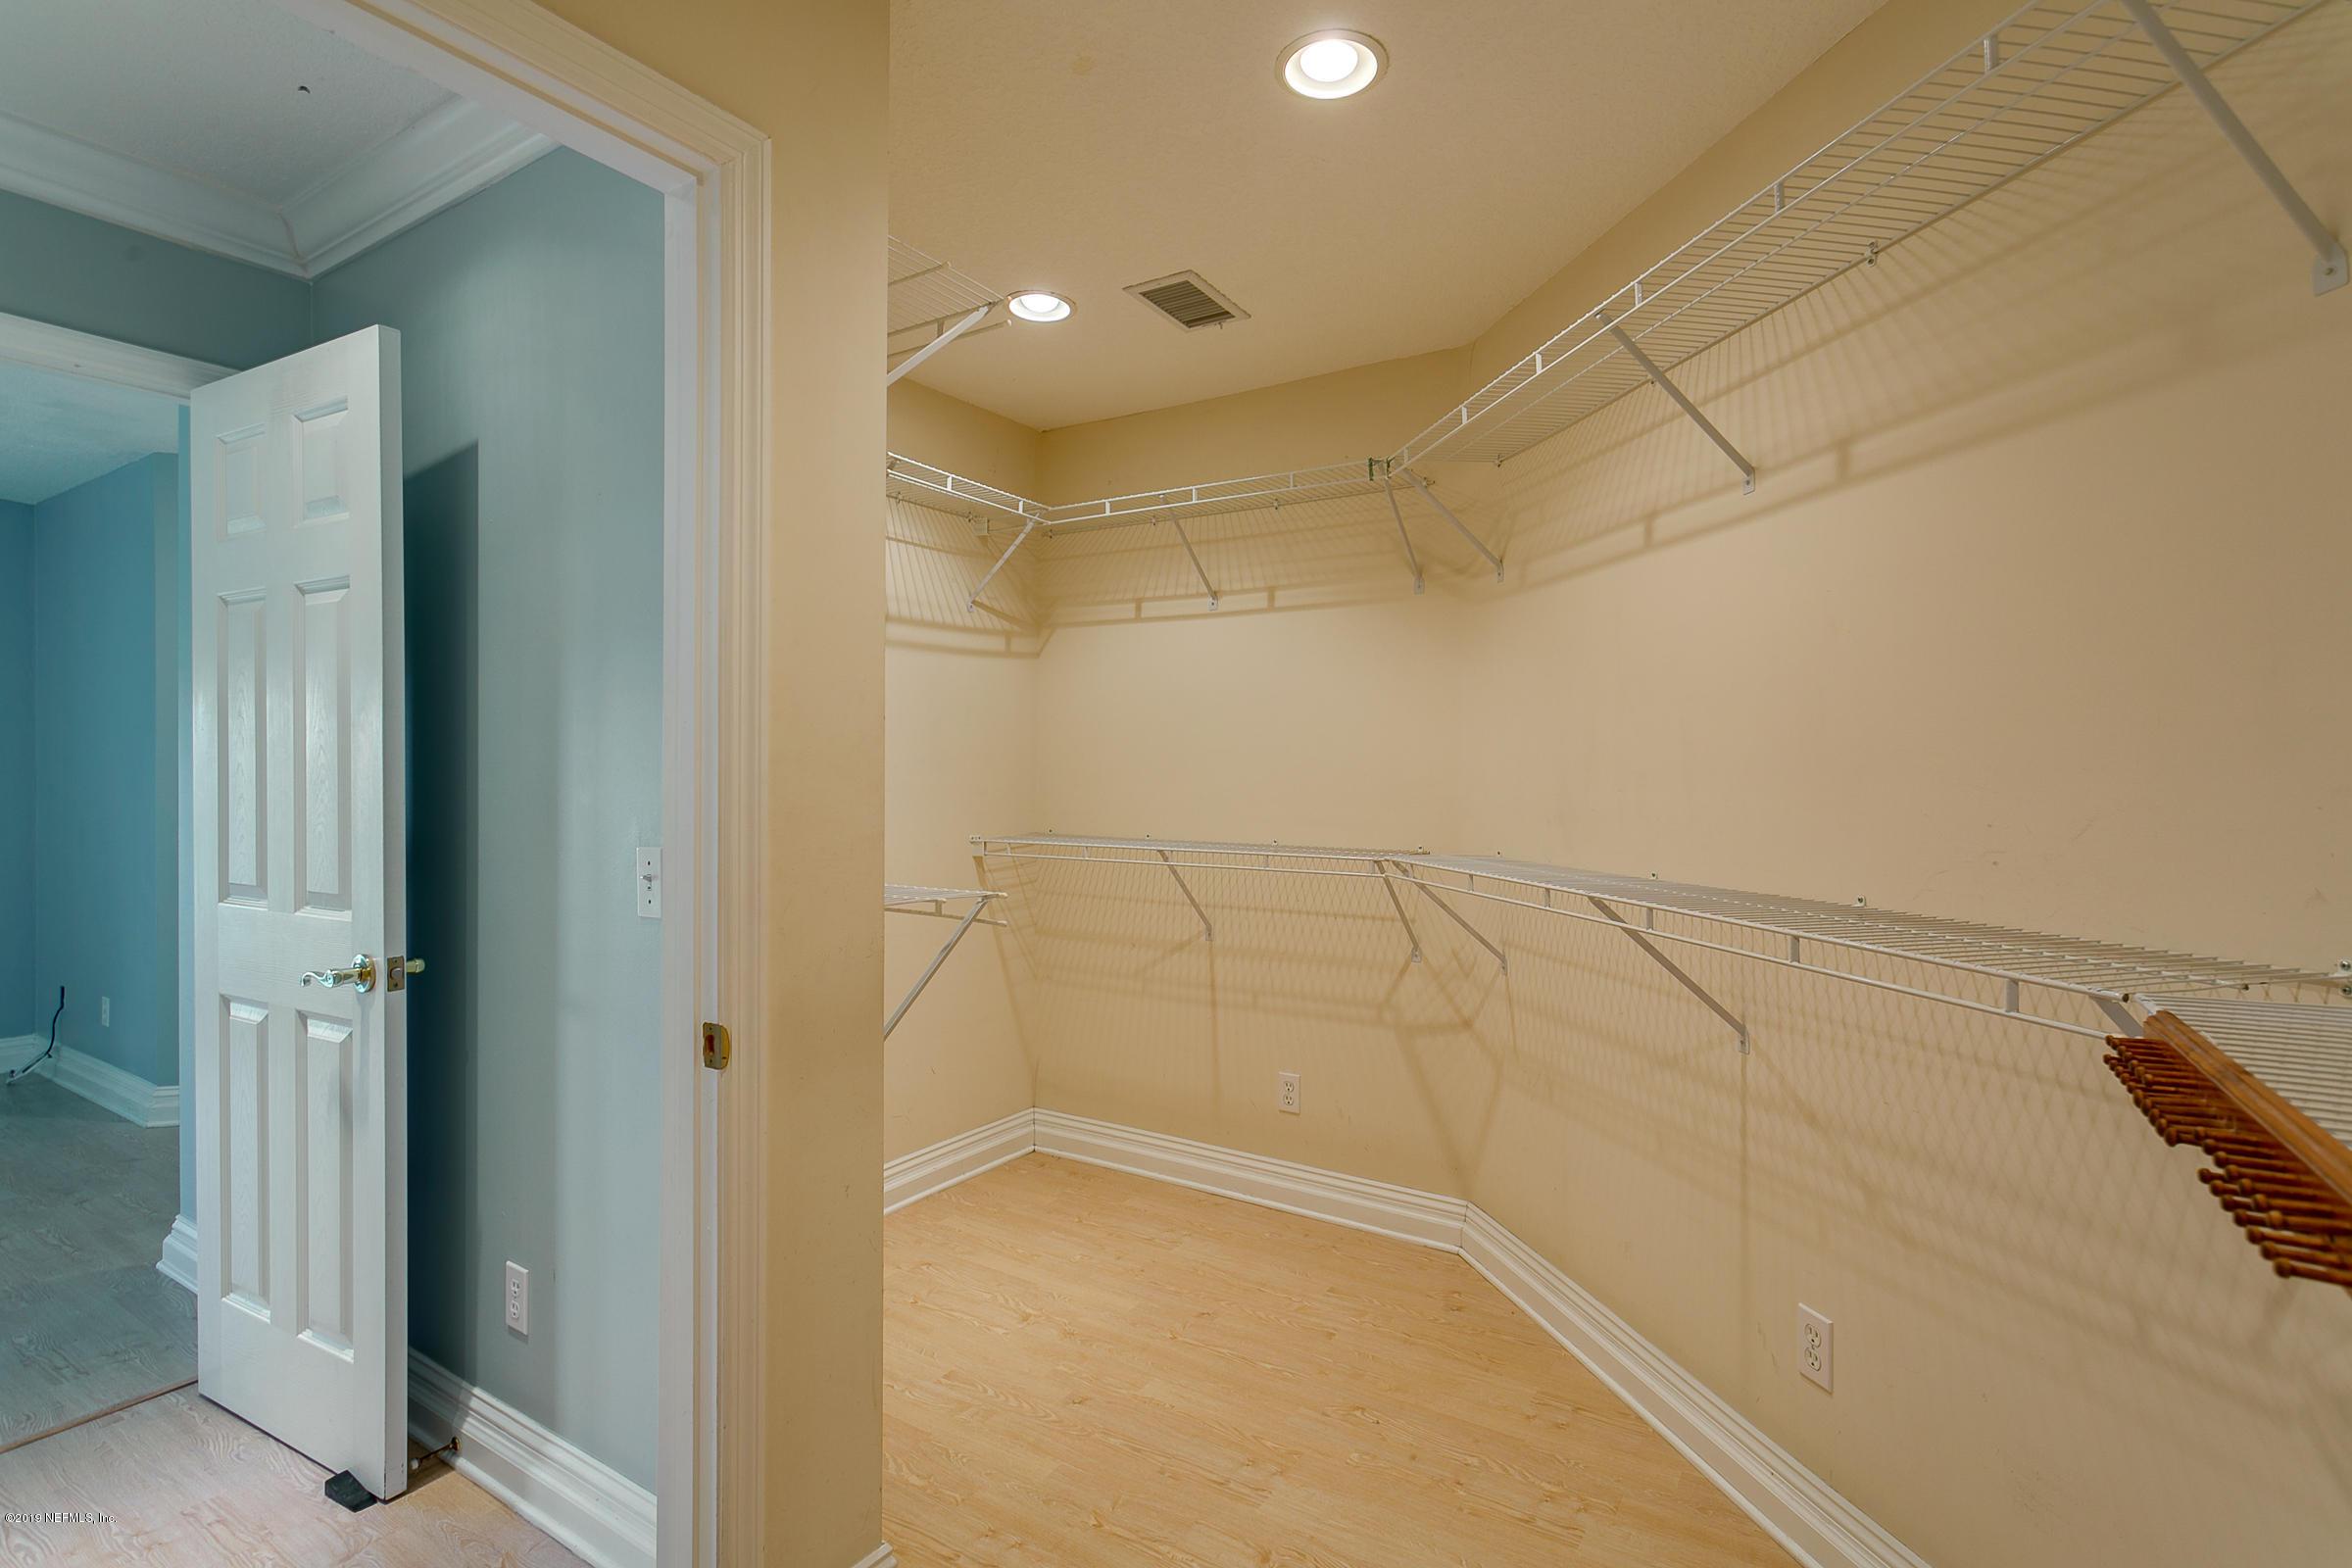 4975 HARVEY GRANT, FLEMING ISLAND, FLORIDA 32003, 3 Bedrooms Bedrooms, ,2 BathroomsBathrooms,Residential,For sale,HARVEY GRANT,1010764